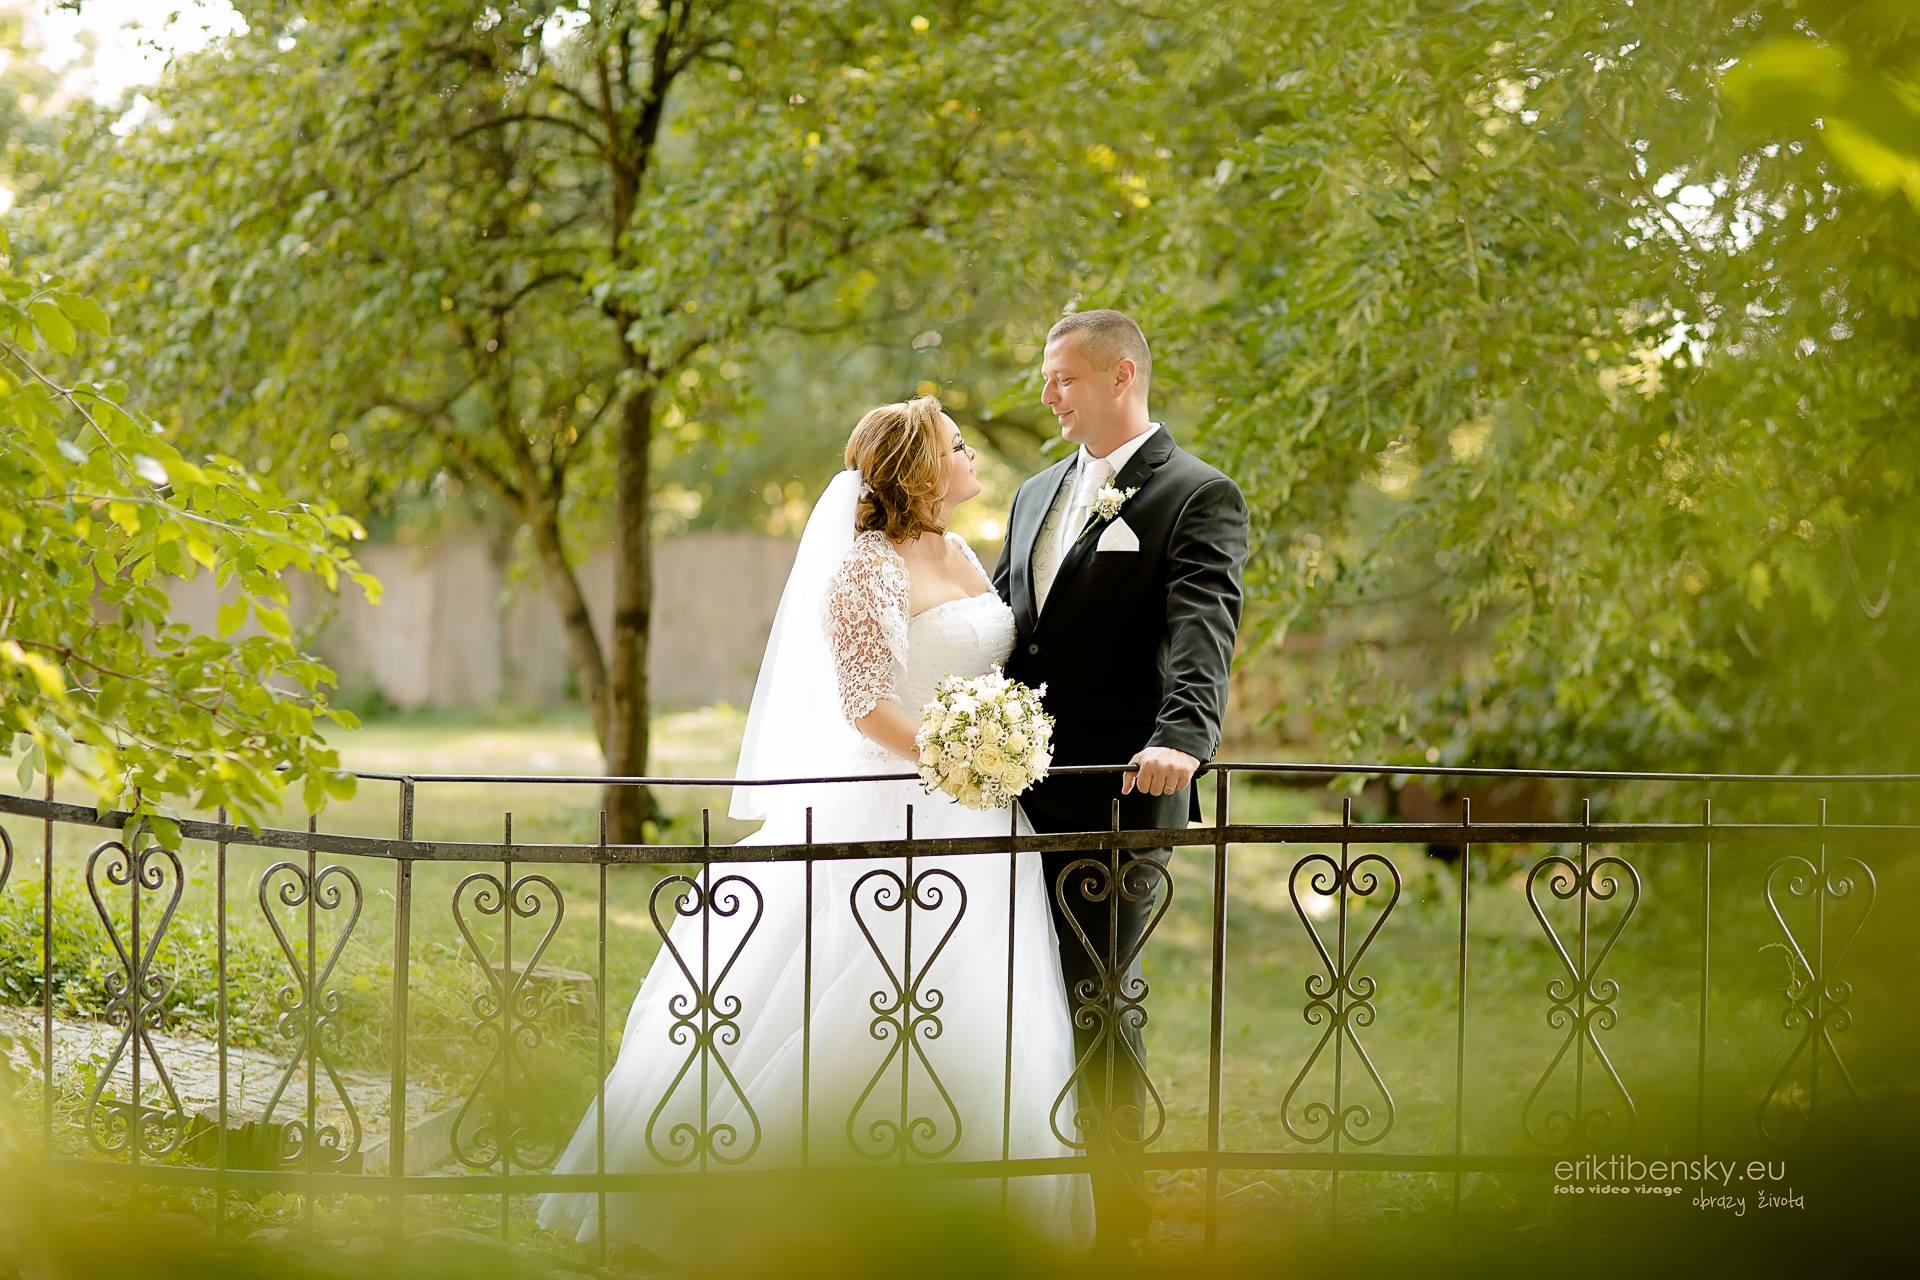 eriktibensky-eu-svadobny-fotograf-wedding-photographer-3029